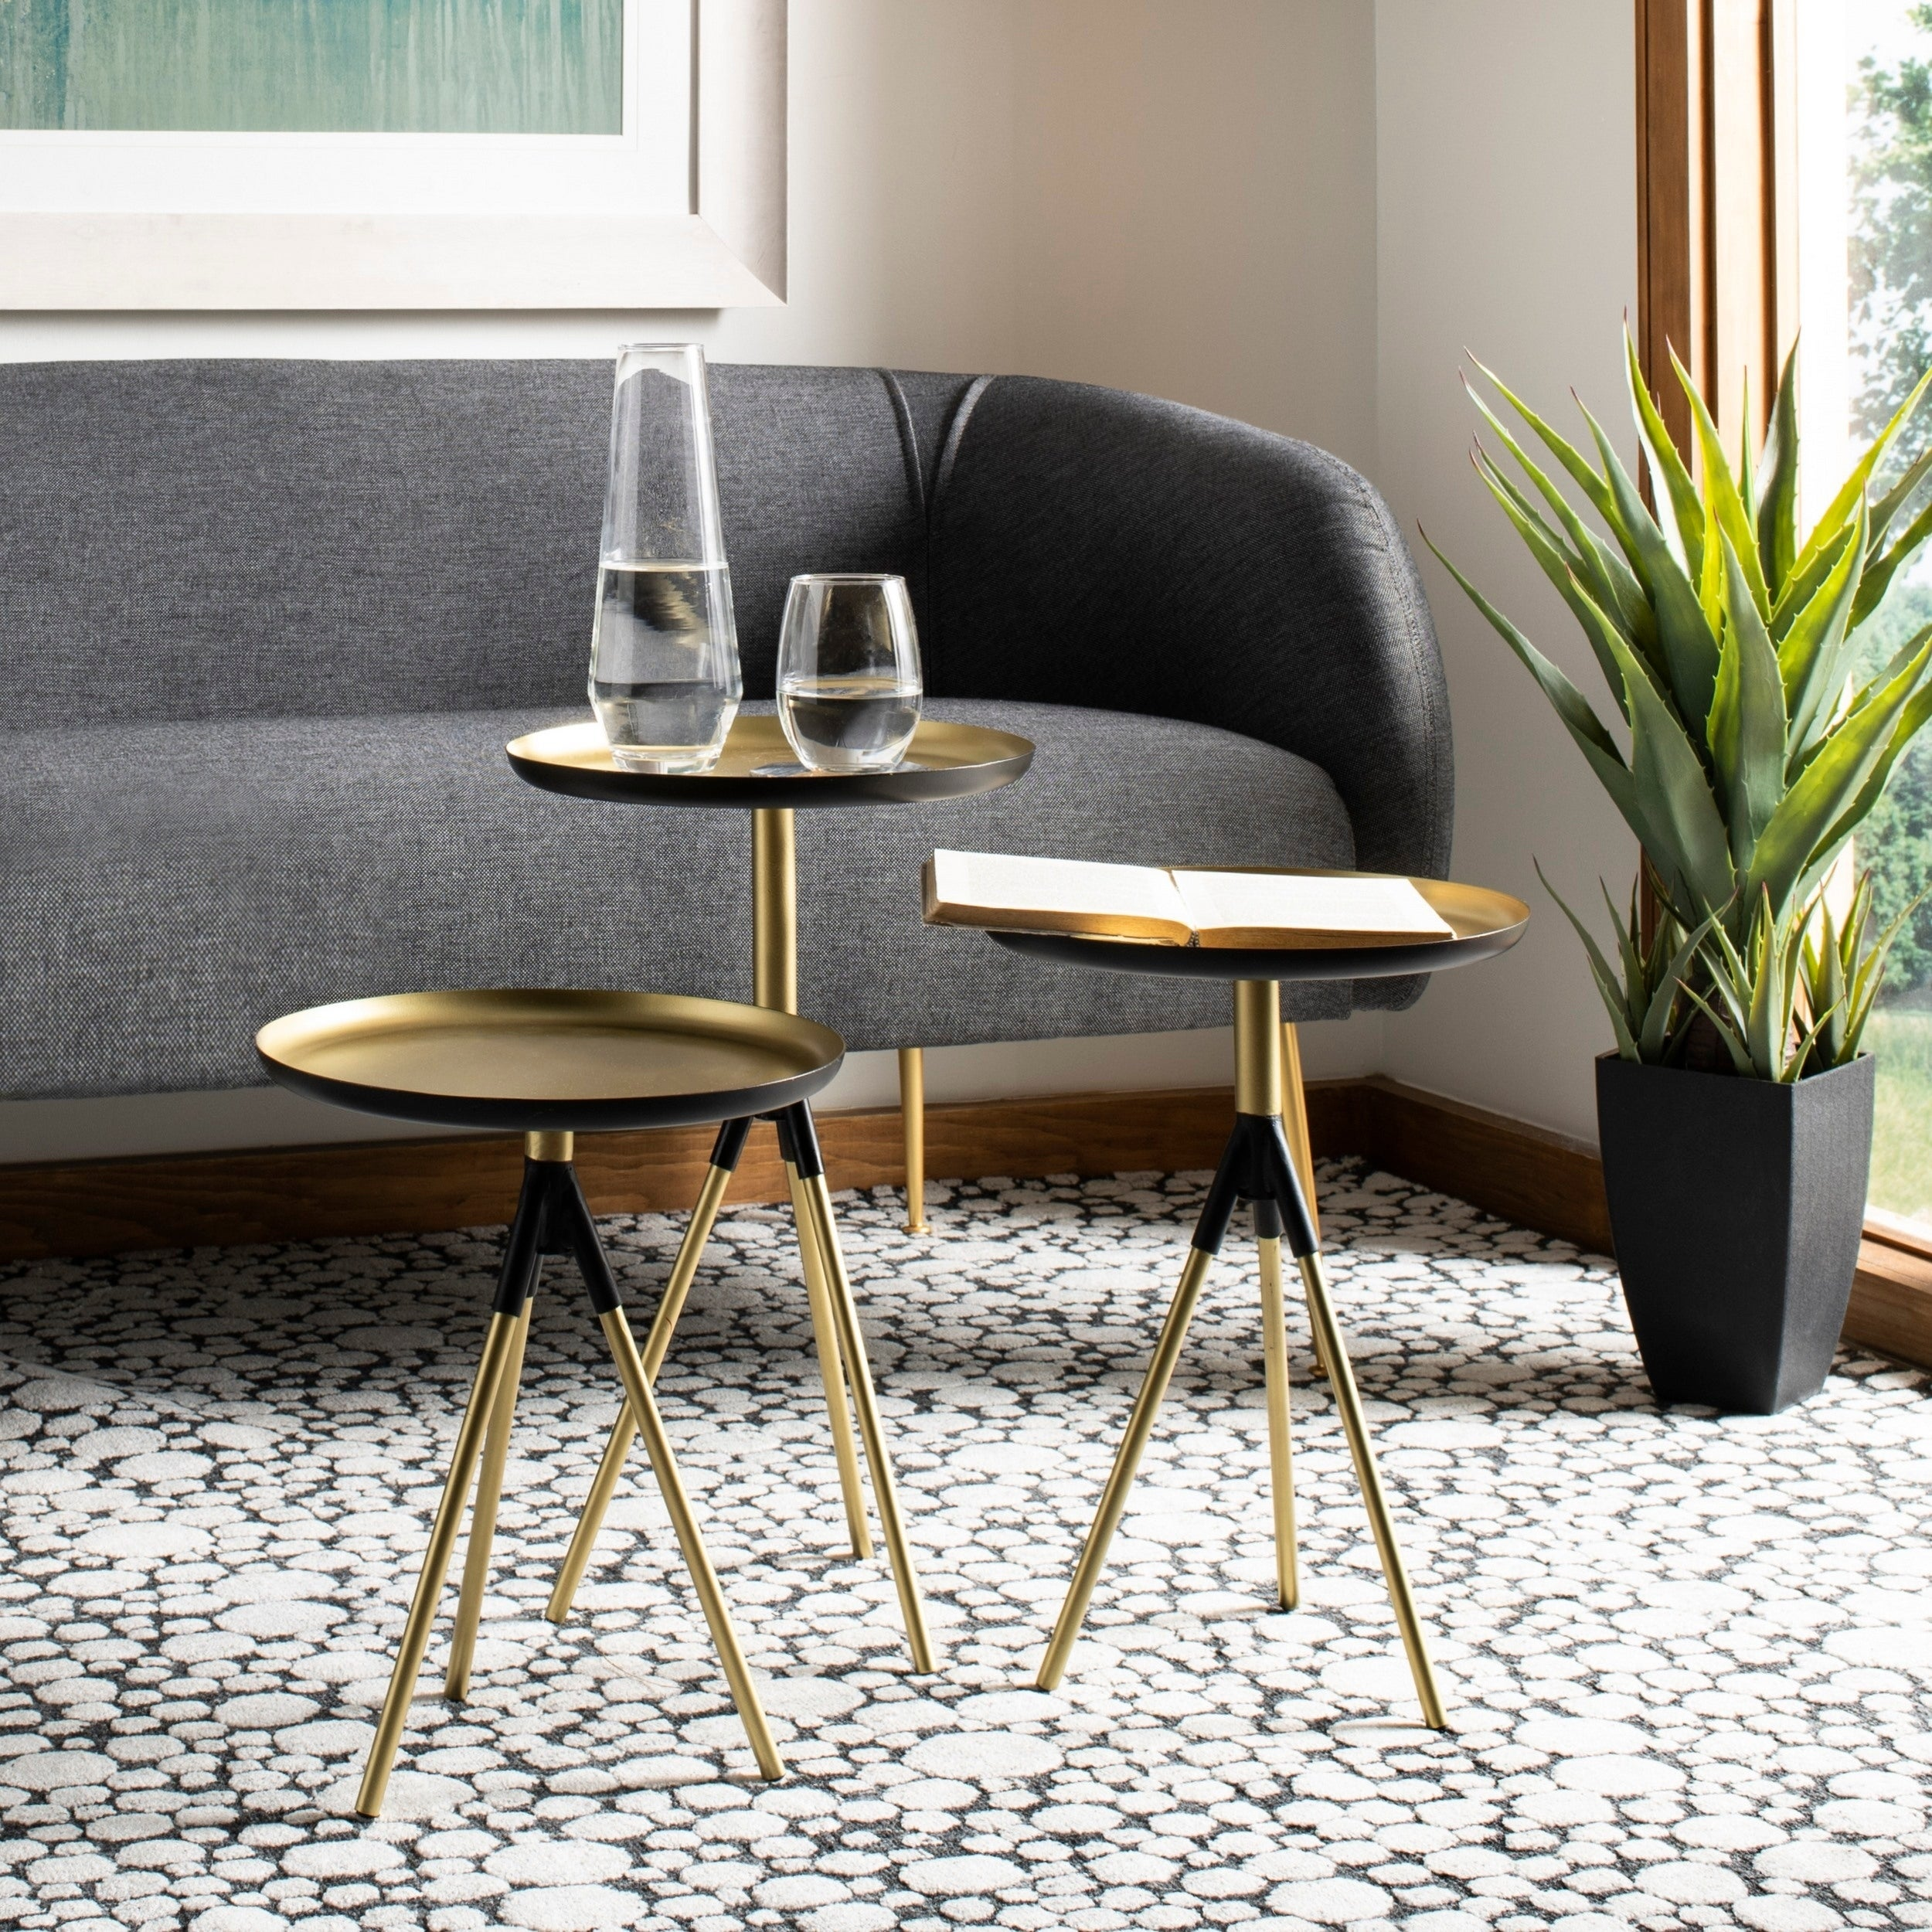 Prime Safavieh Talon Metal Side Table Set Of 3 Gold Black Bralicious Painted Fabric Chair Ideas Braliciousco